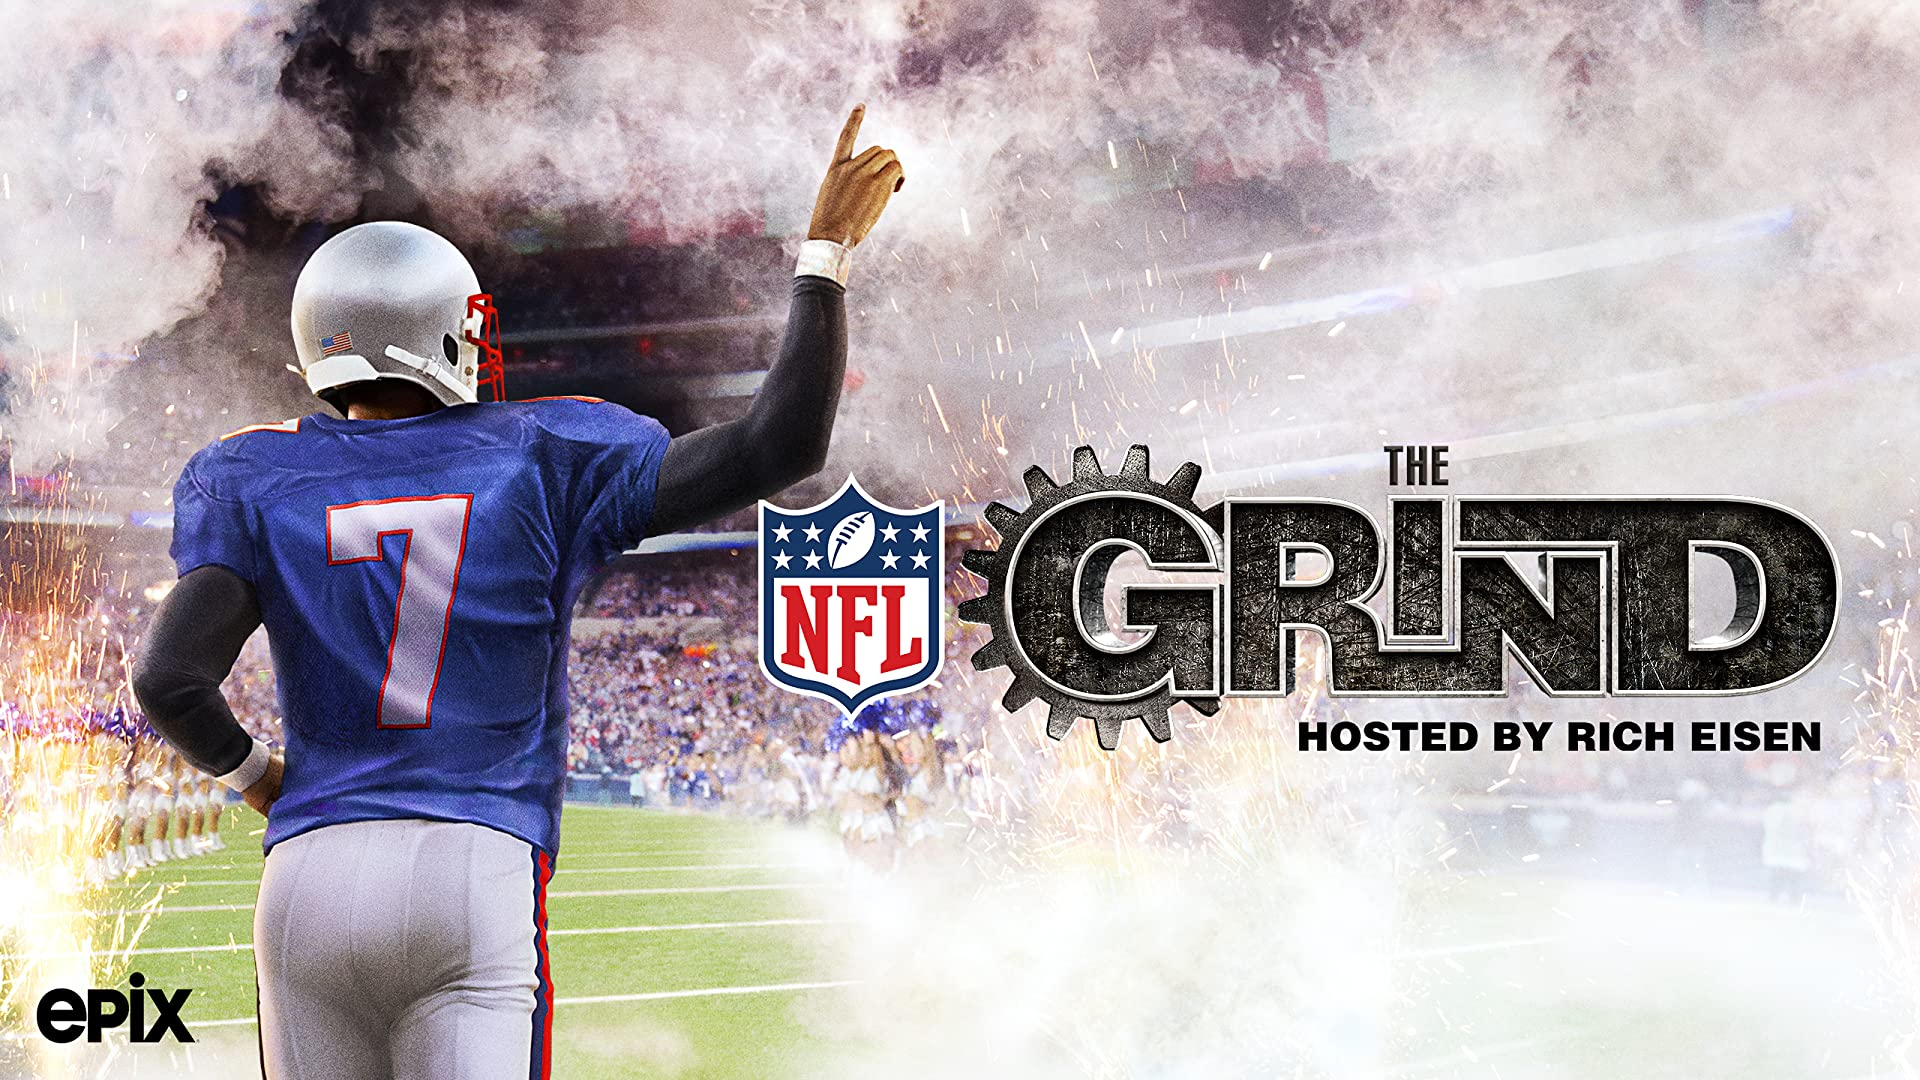 NFL: The Grind Season 1